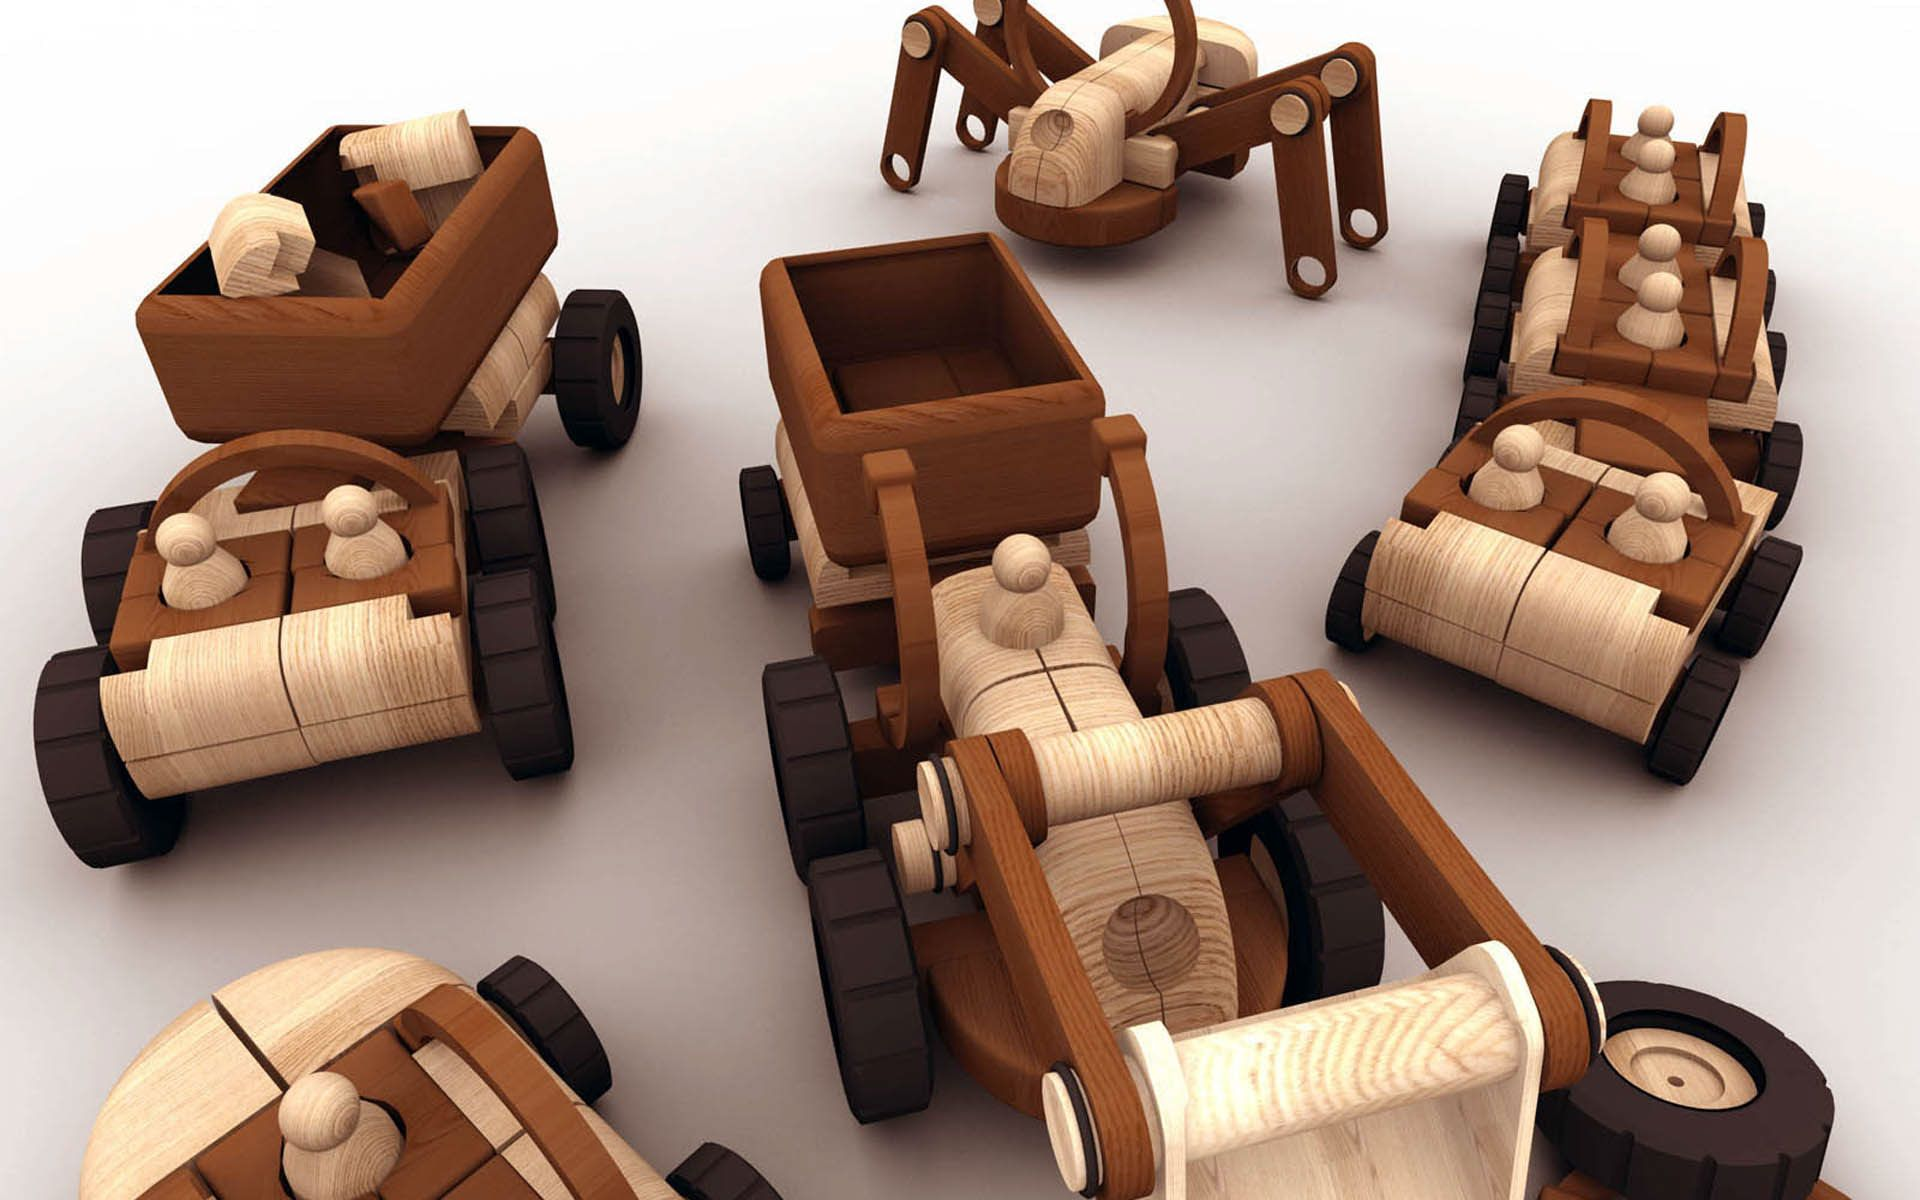 V Sledek Obr Zku Pro Wooden Toys